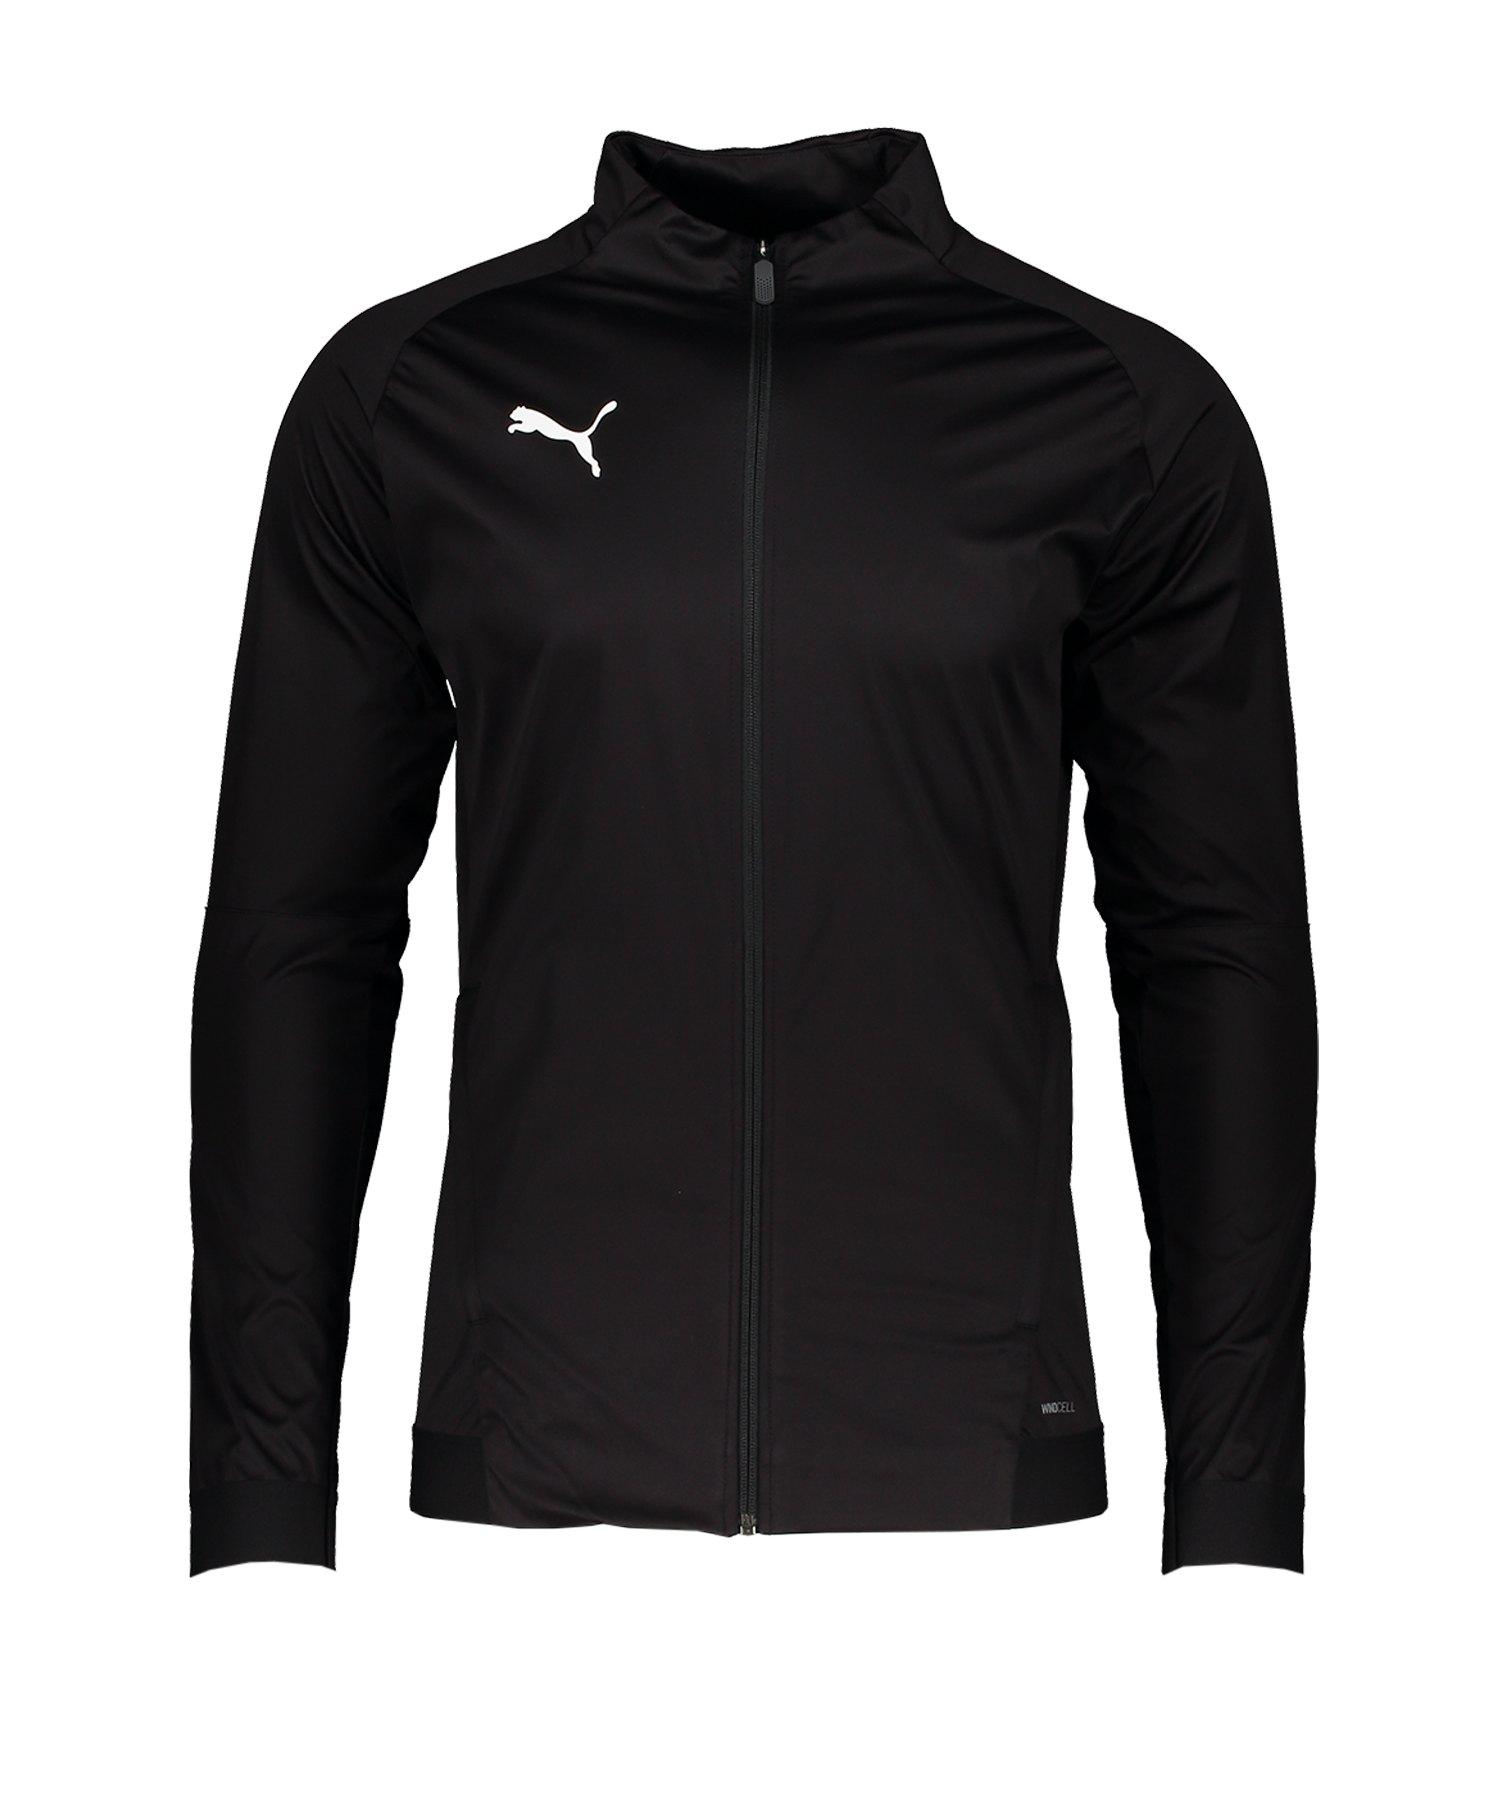 PUMA LIGA Sideline Softshell Jacket Jacke F03 - schwarz